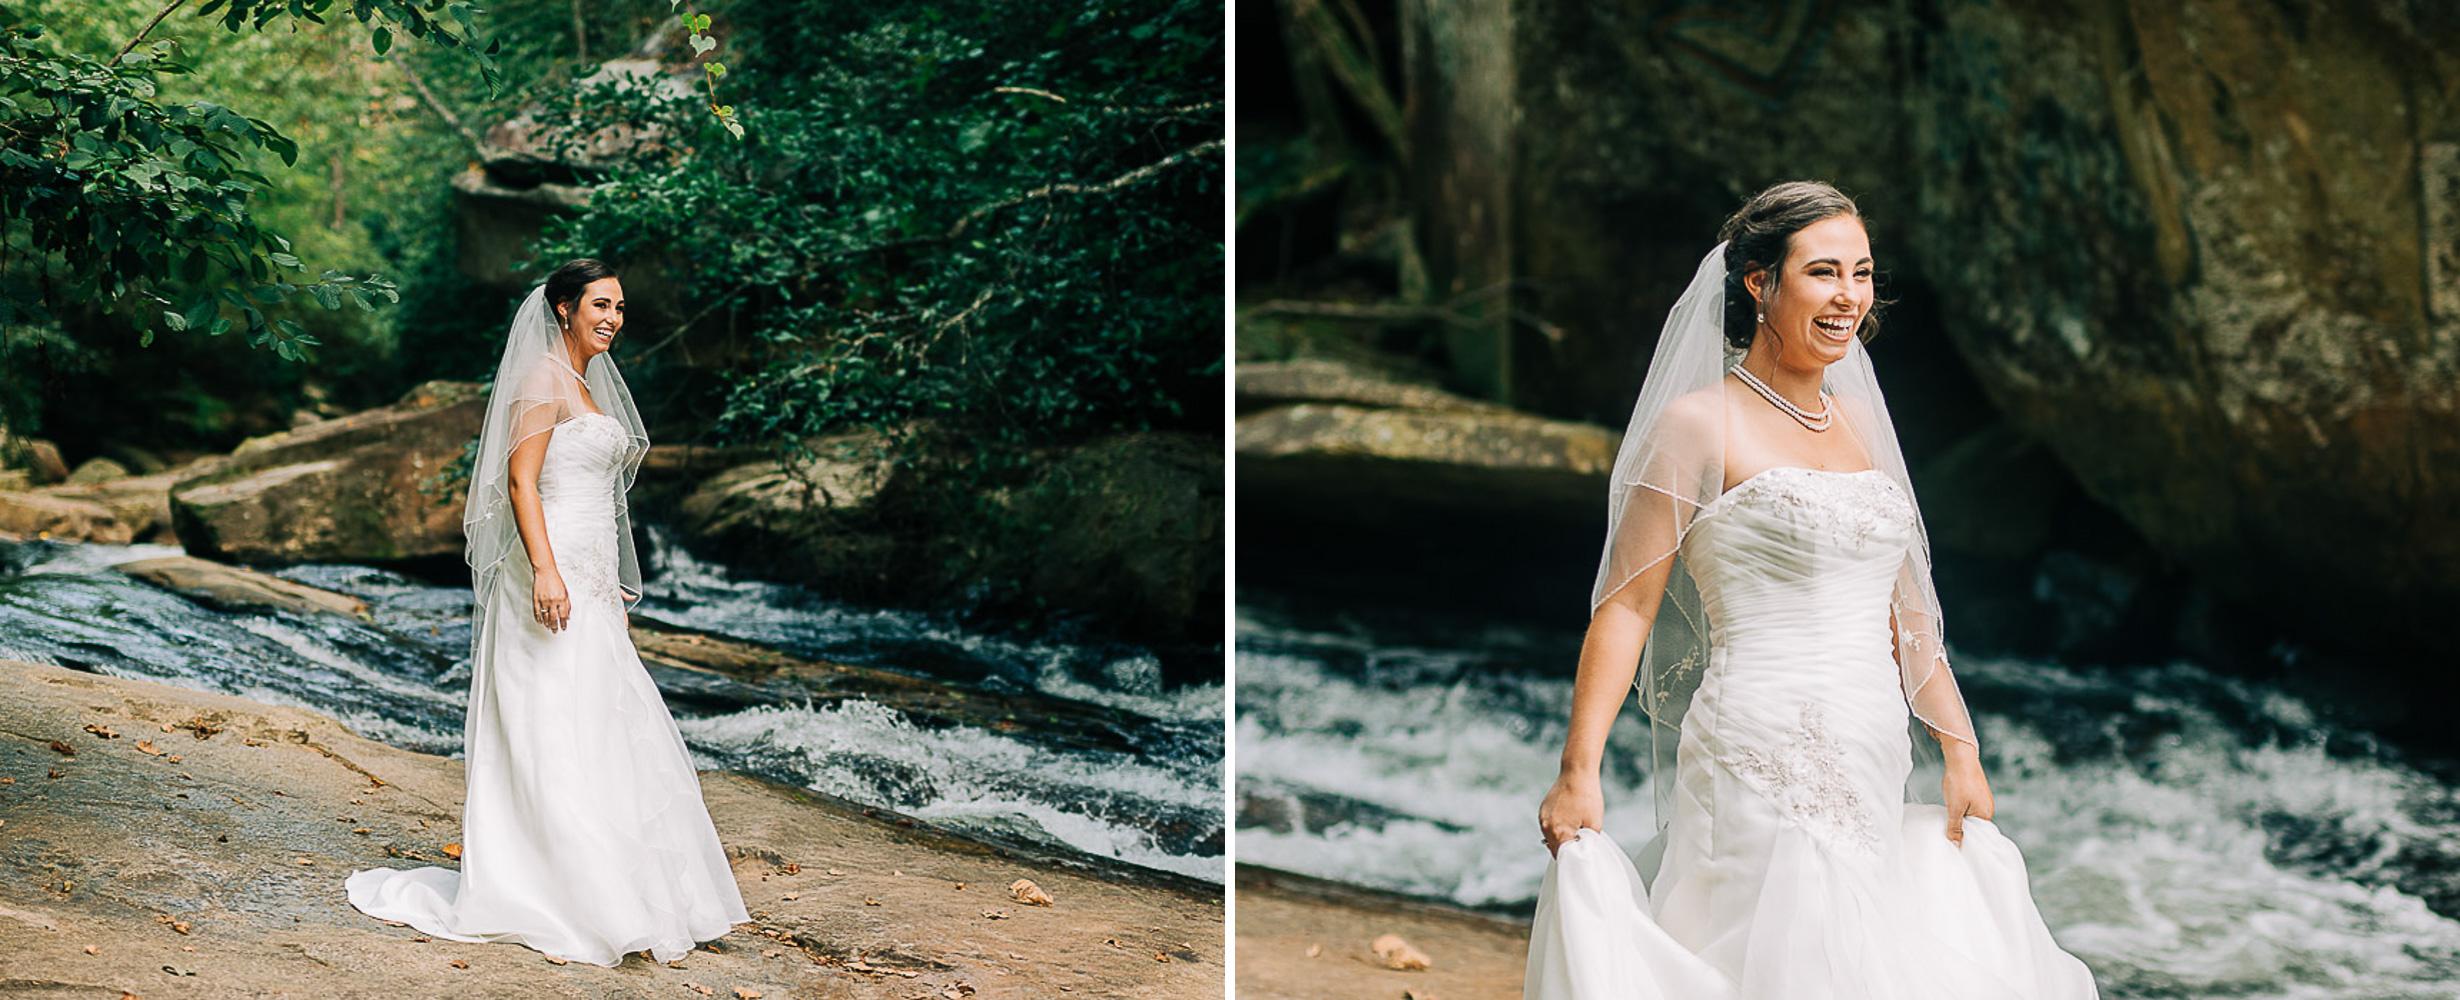 River Bridal Portraits, South Carolina Wedding Photographer, 06.jpg